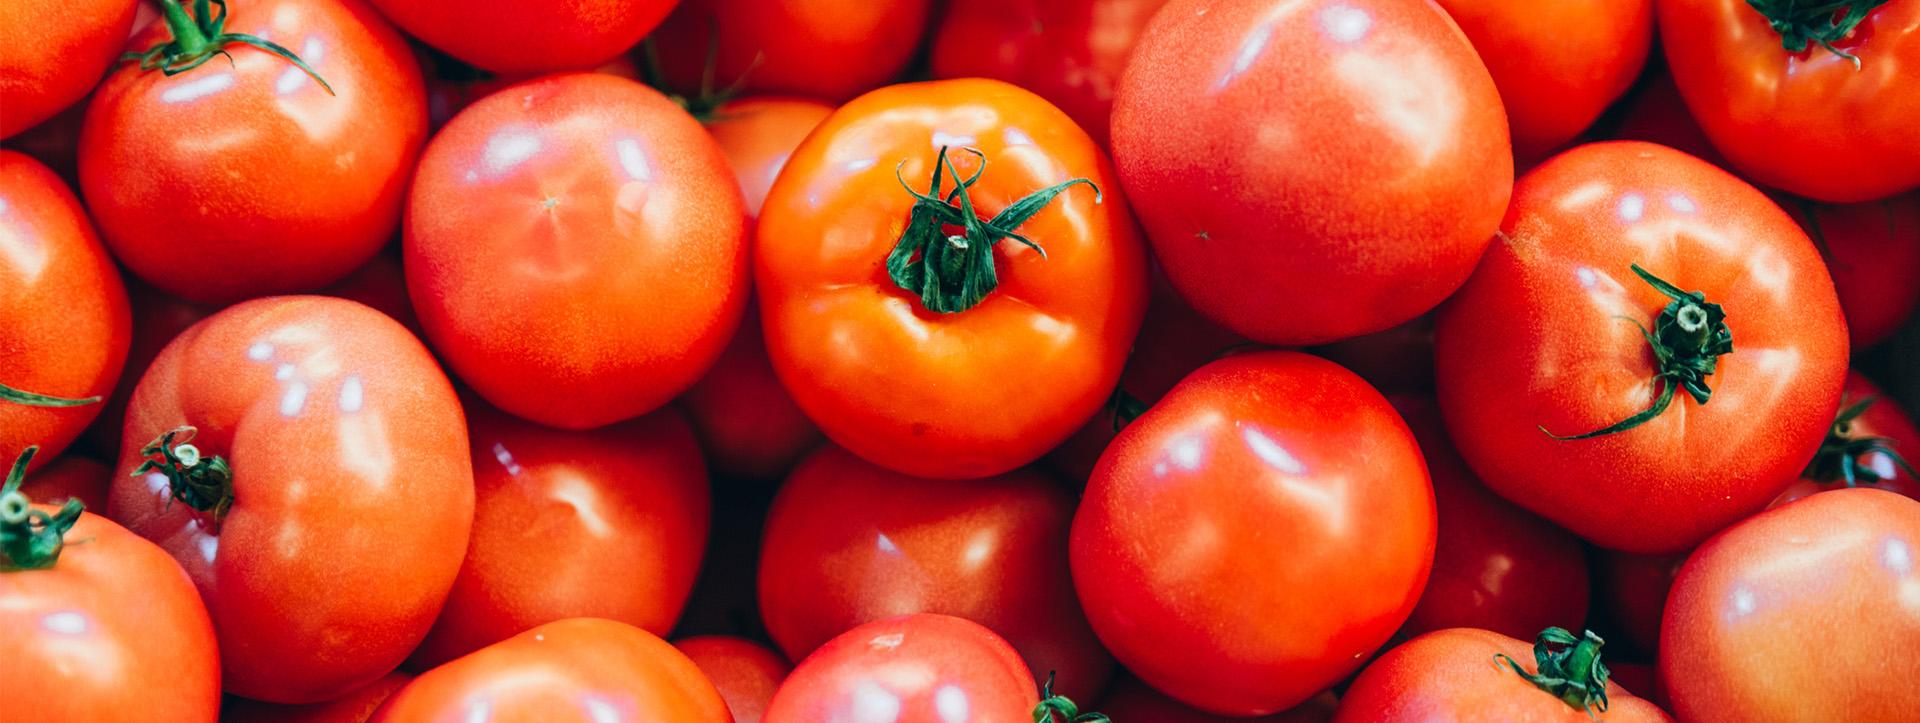 El tomate fruta o verdura